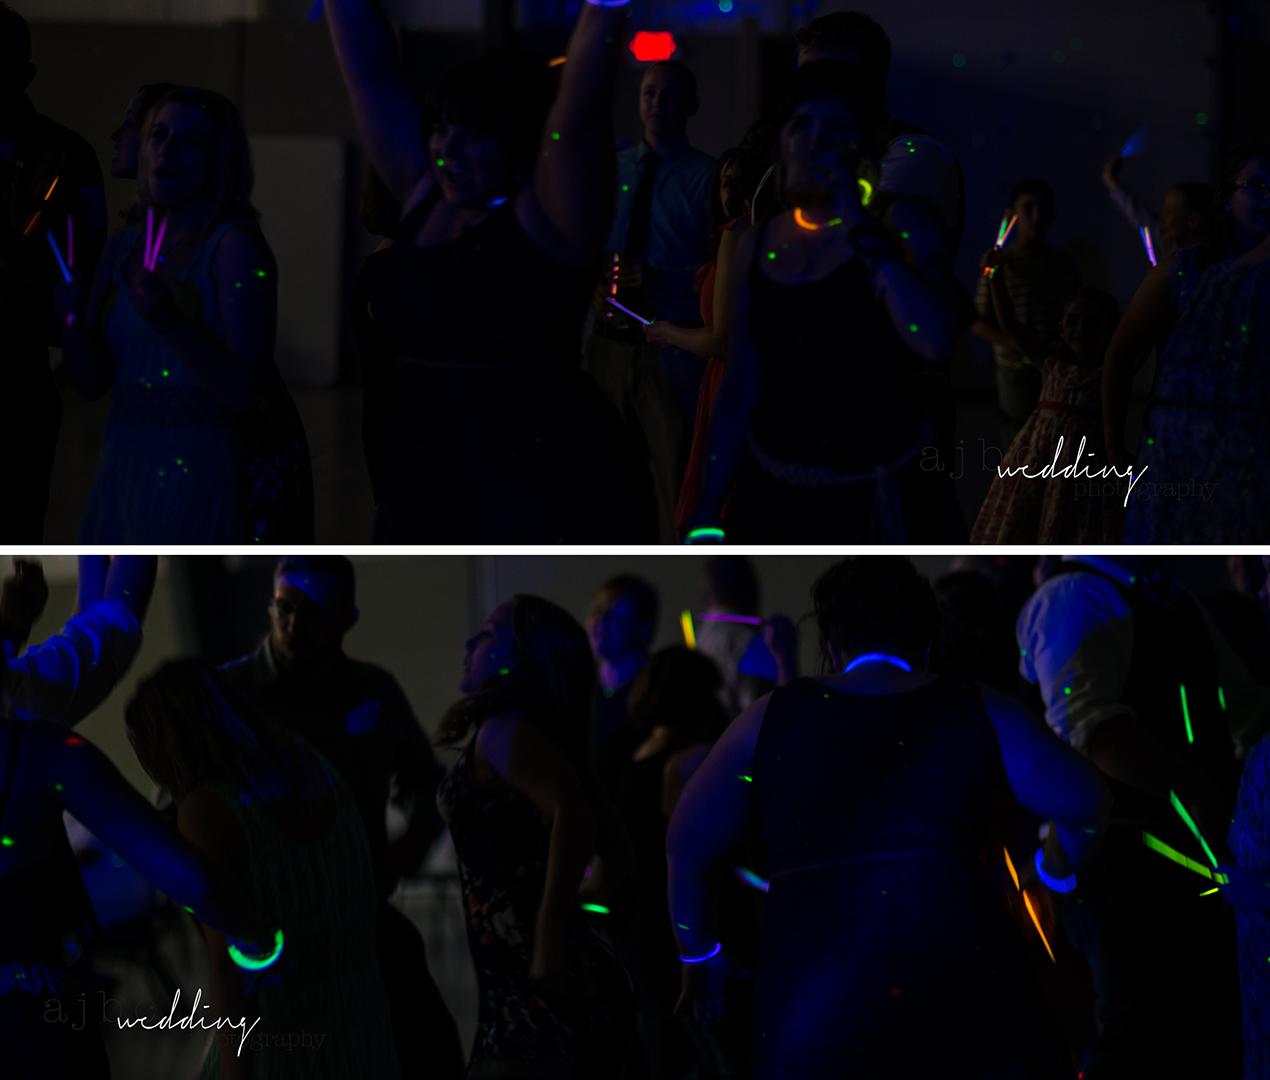 ajbcphotography-port-huron-michigan-wedding-photographer-outdoors-summer-wedding-country-wedding-wadhams-michigan-bride-groom-love-reception-dance-party.jpg